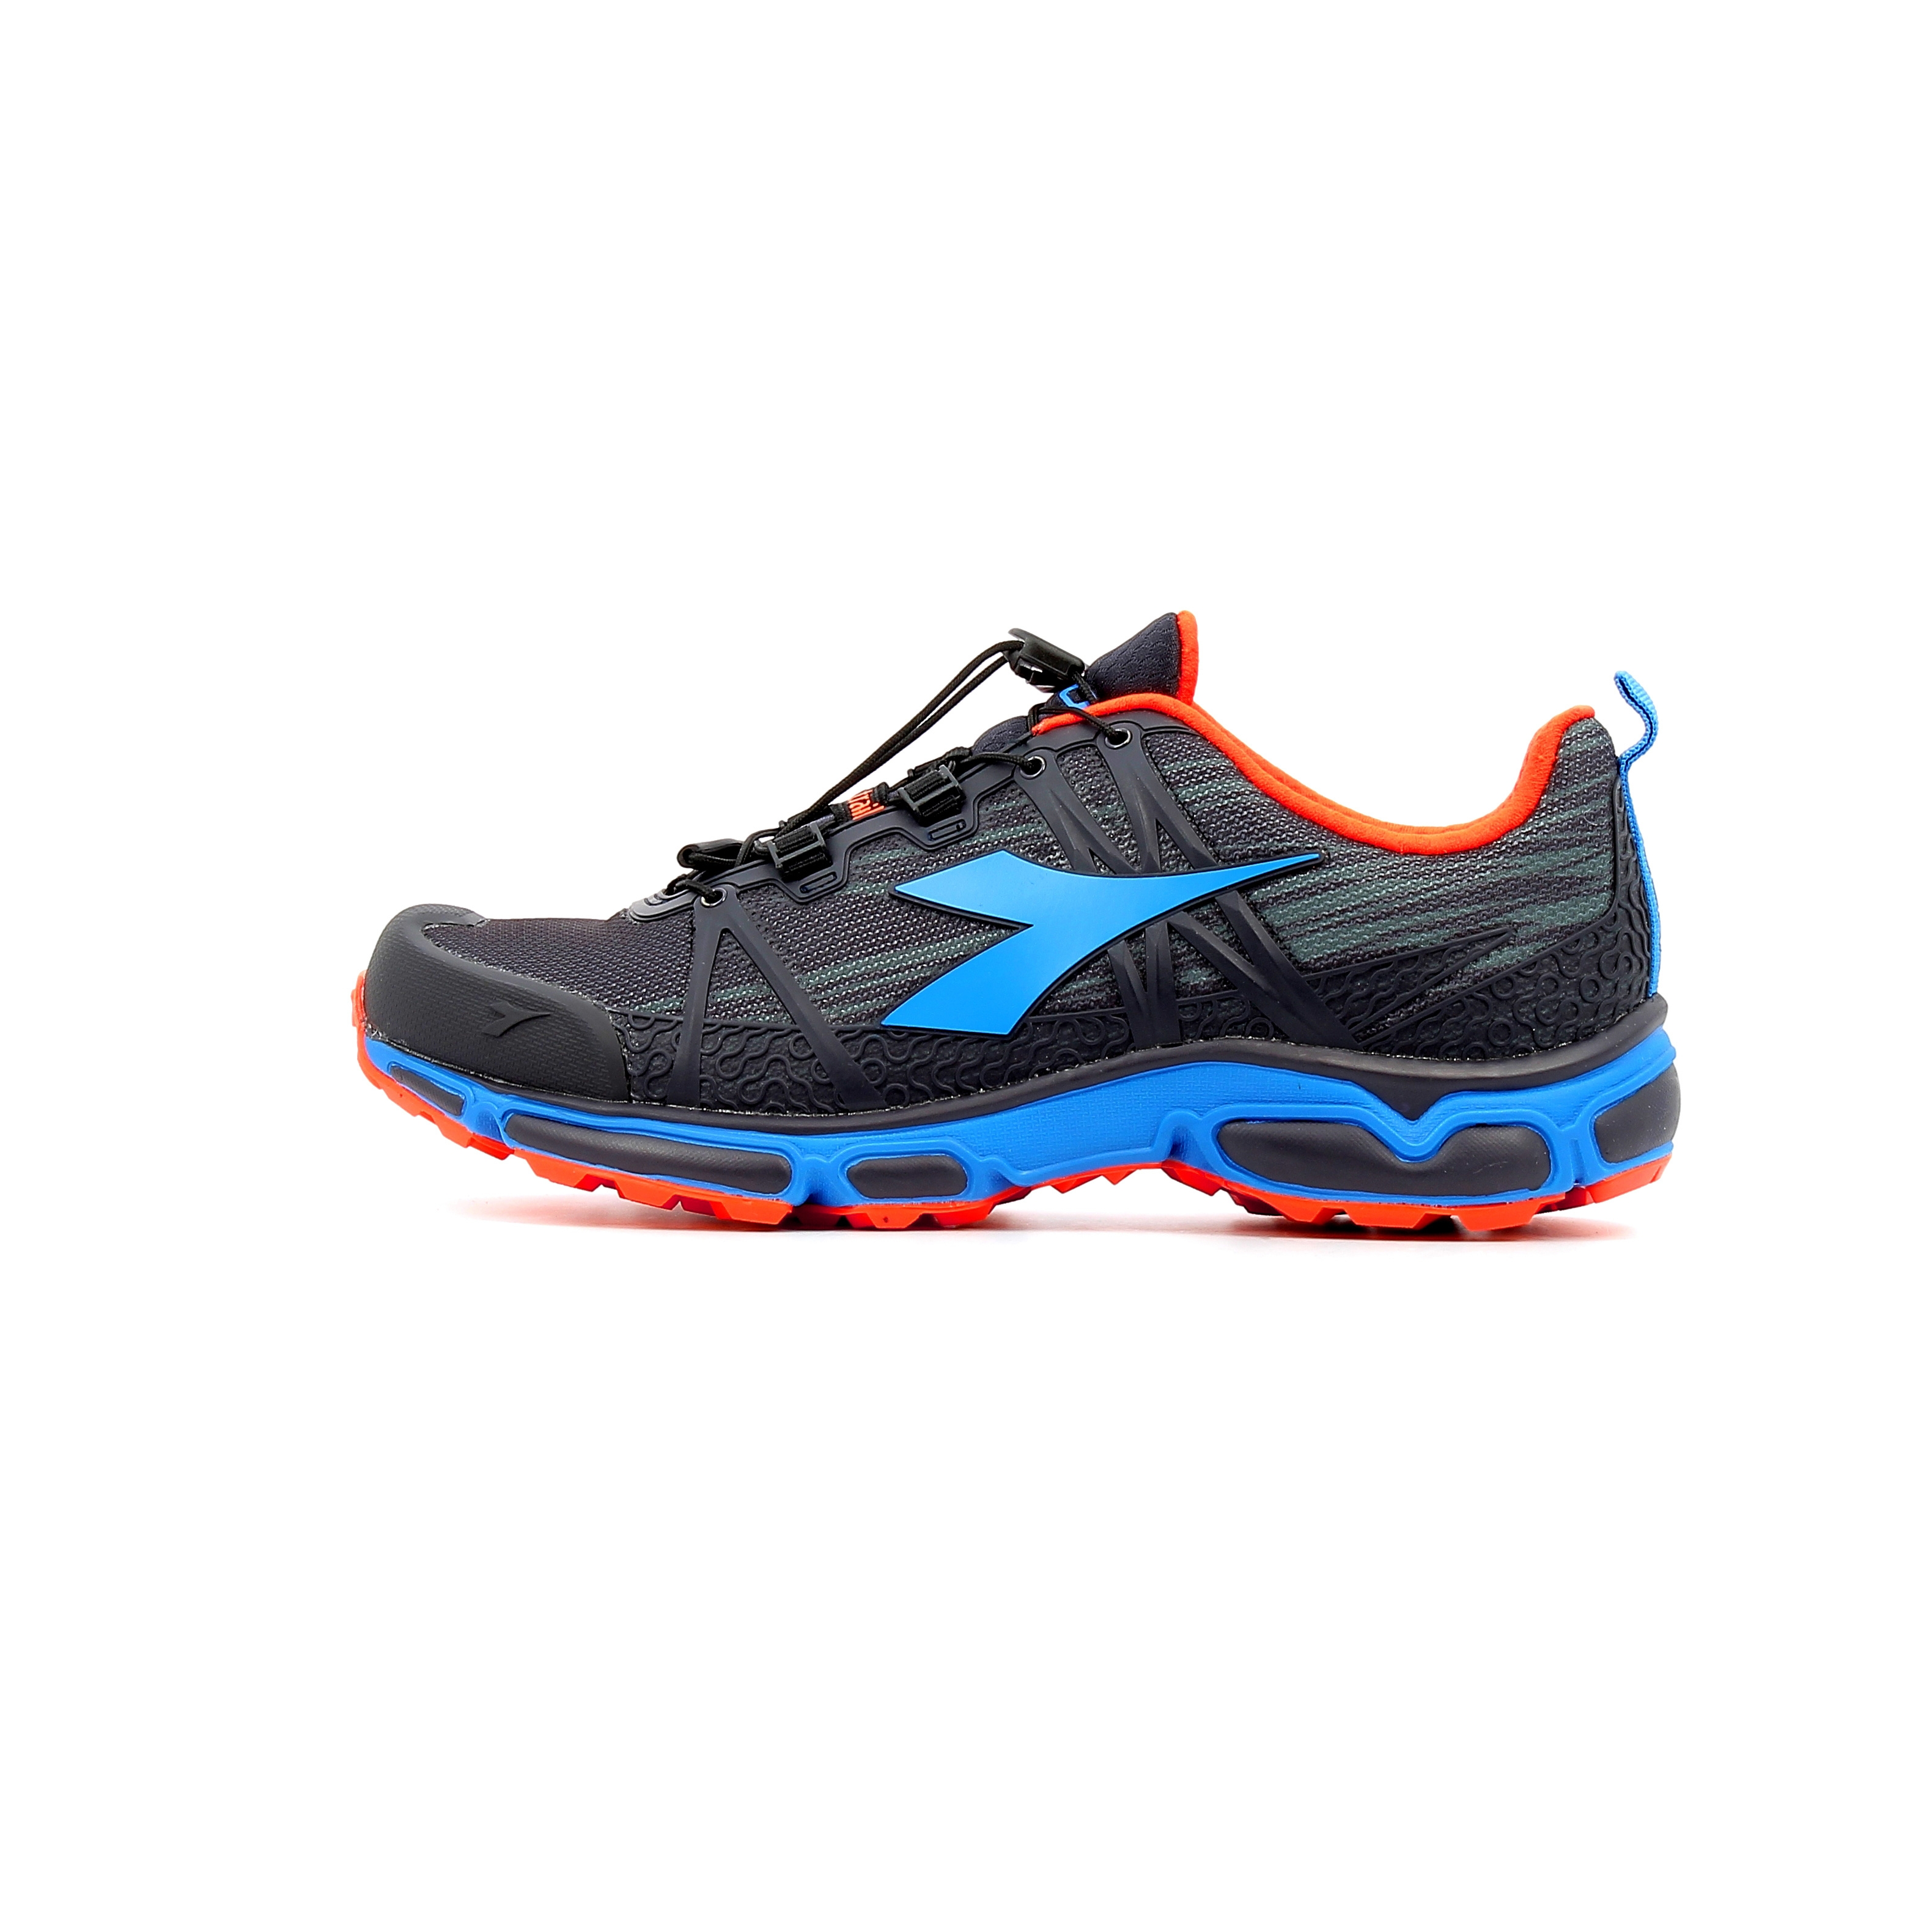 Chaussures de Trail Diadora Trail Race  f834c780d6f